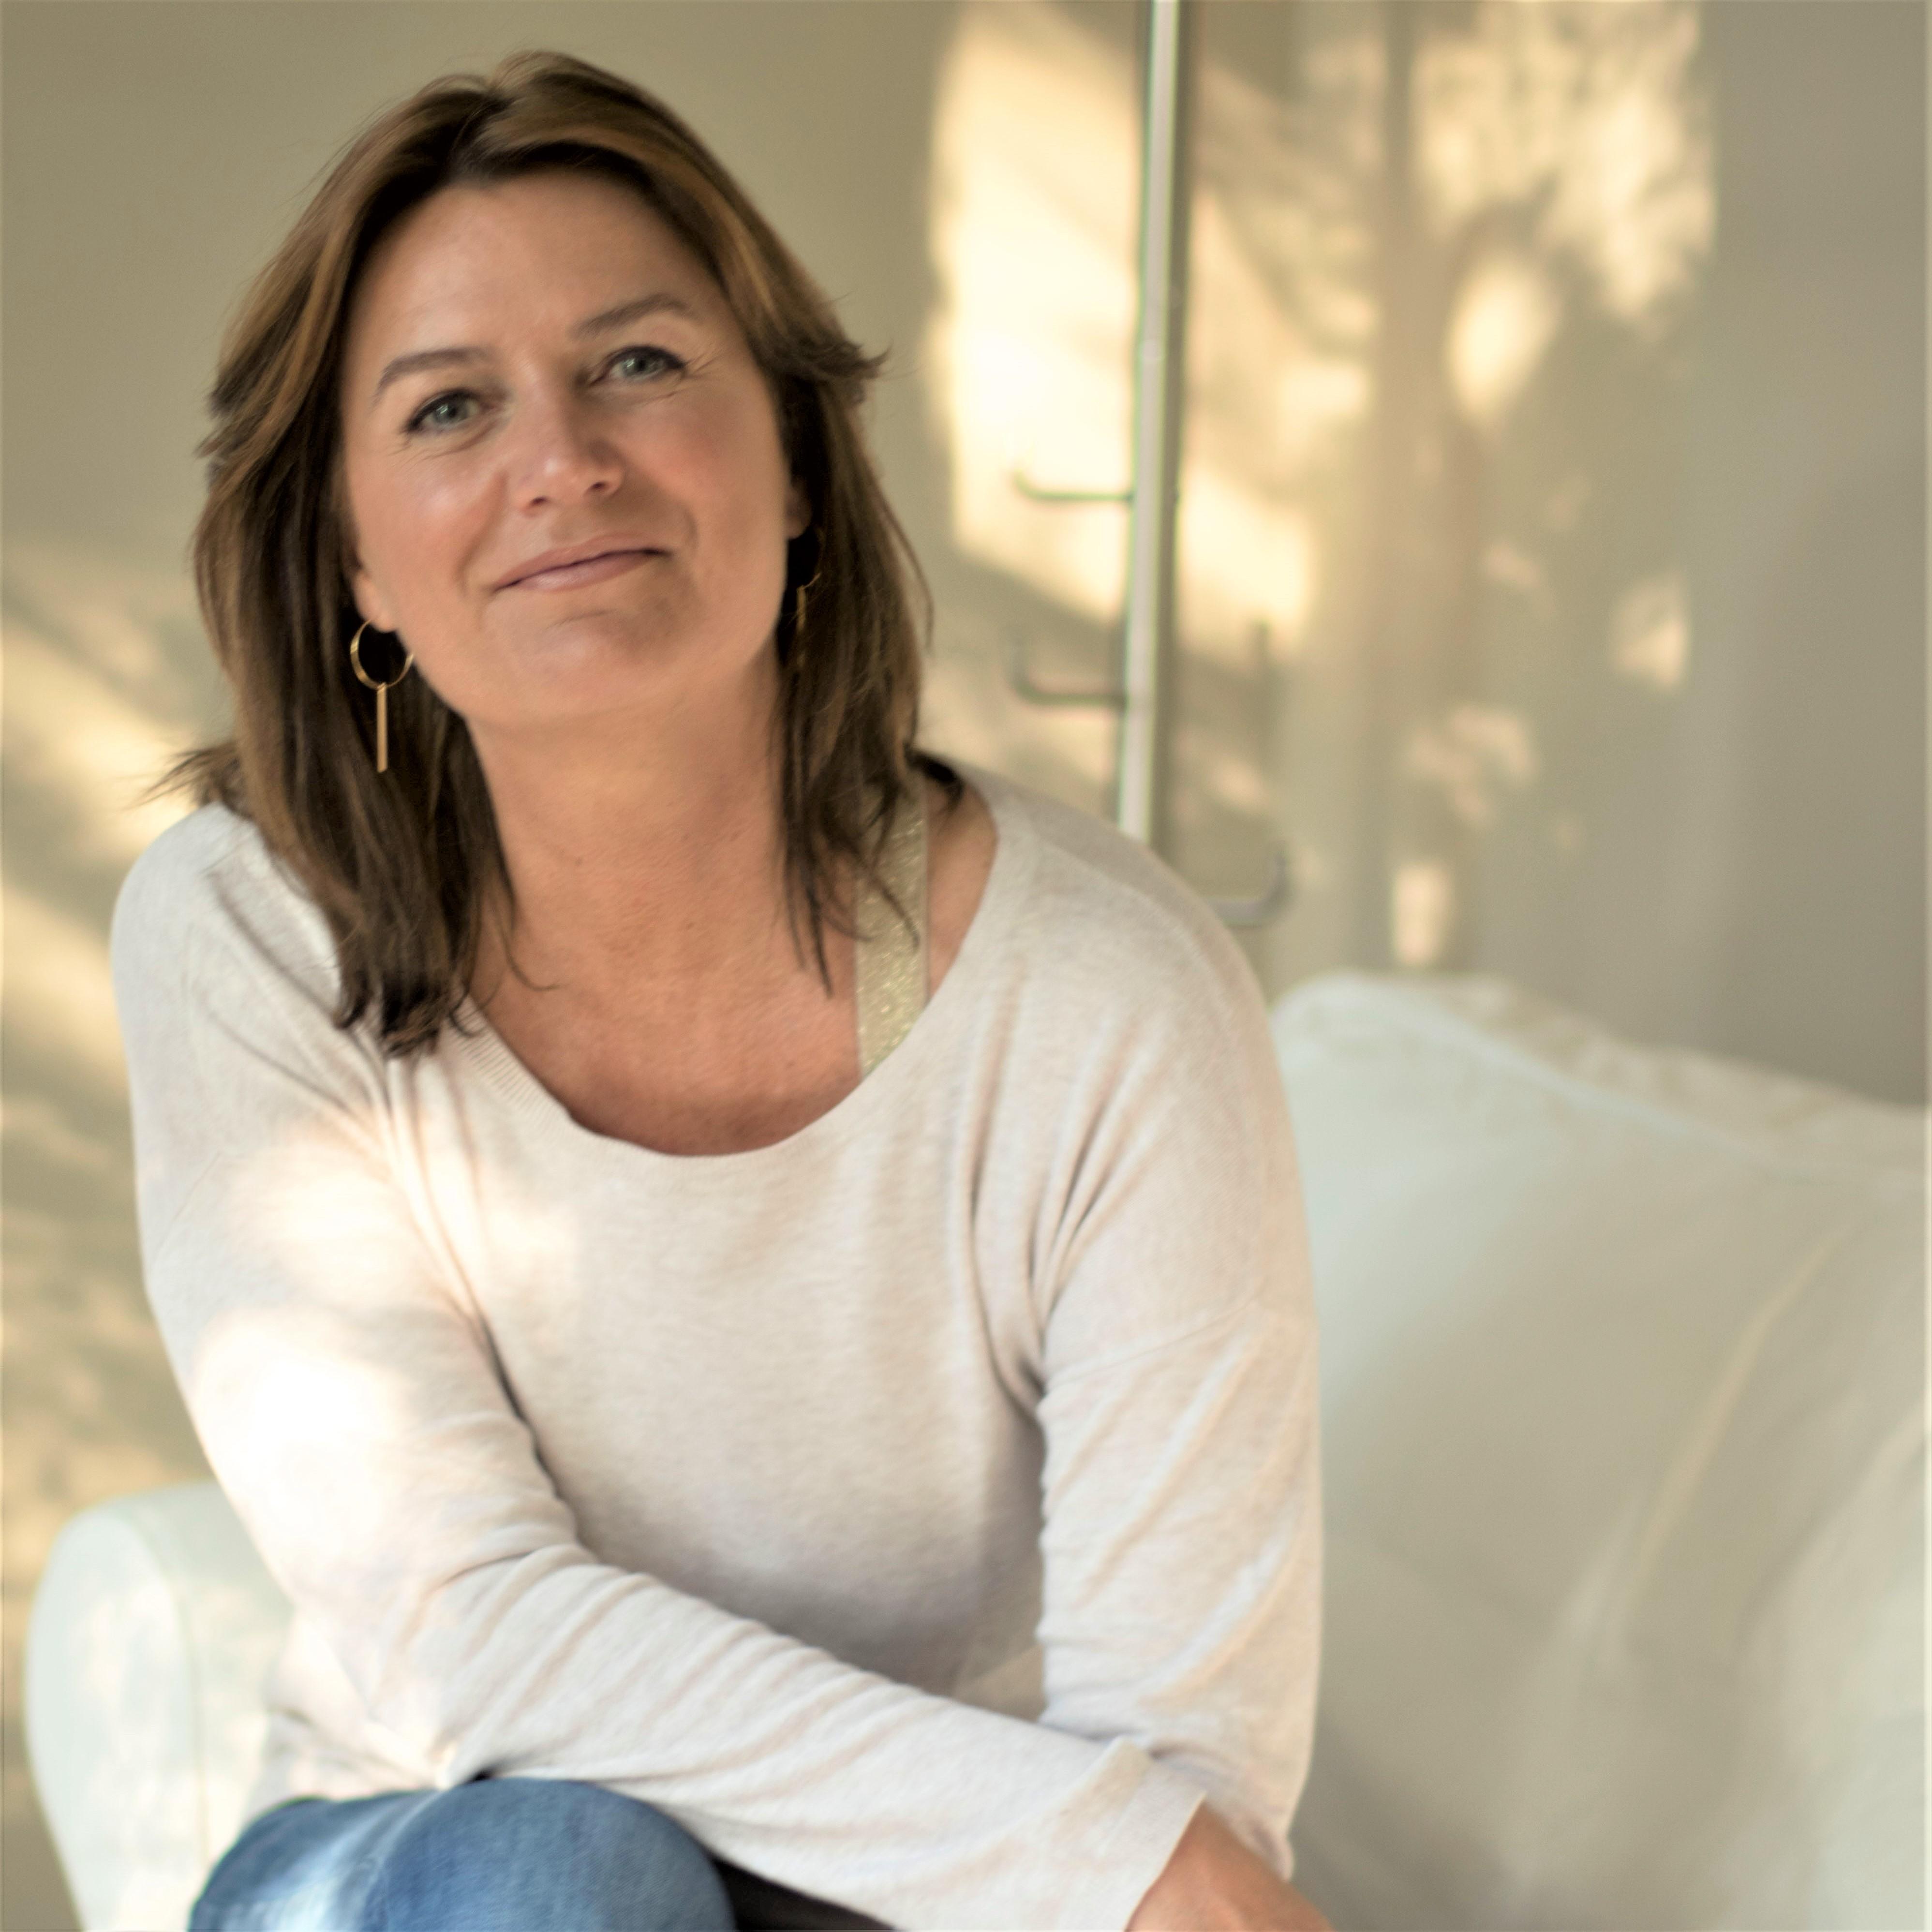 Bianca Richmond - Huidspecialiste & Founder